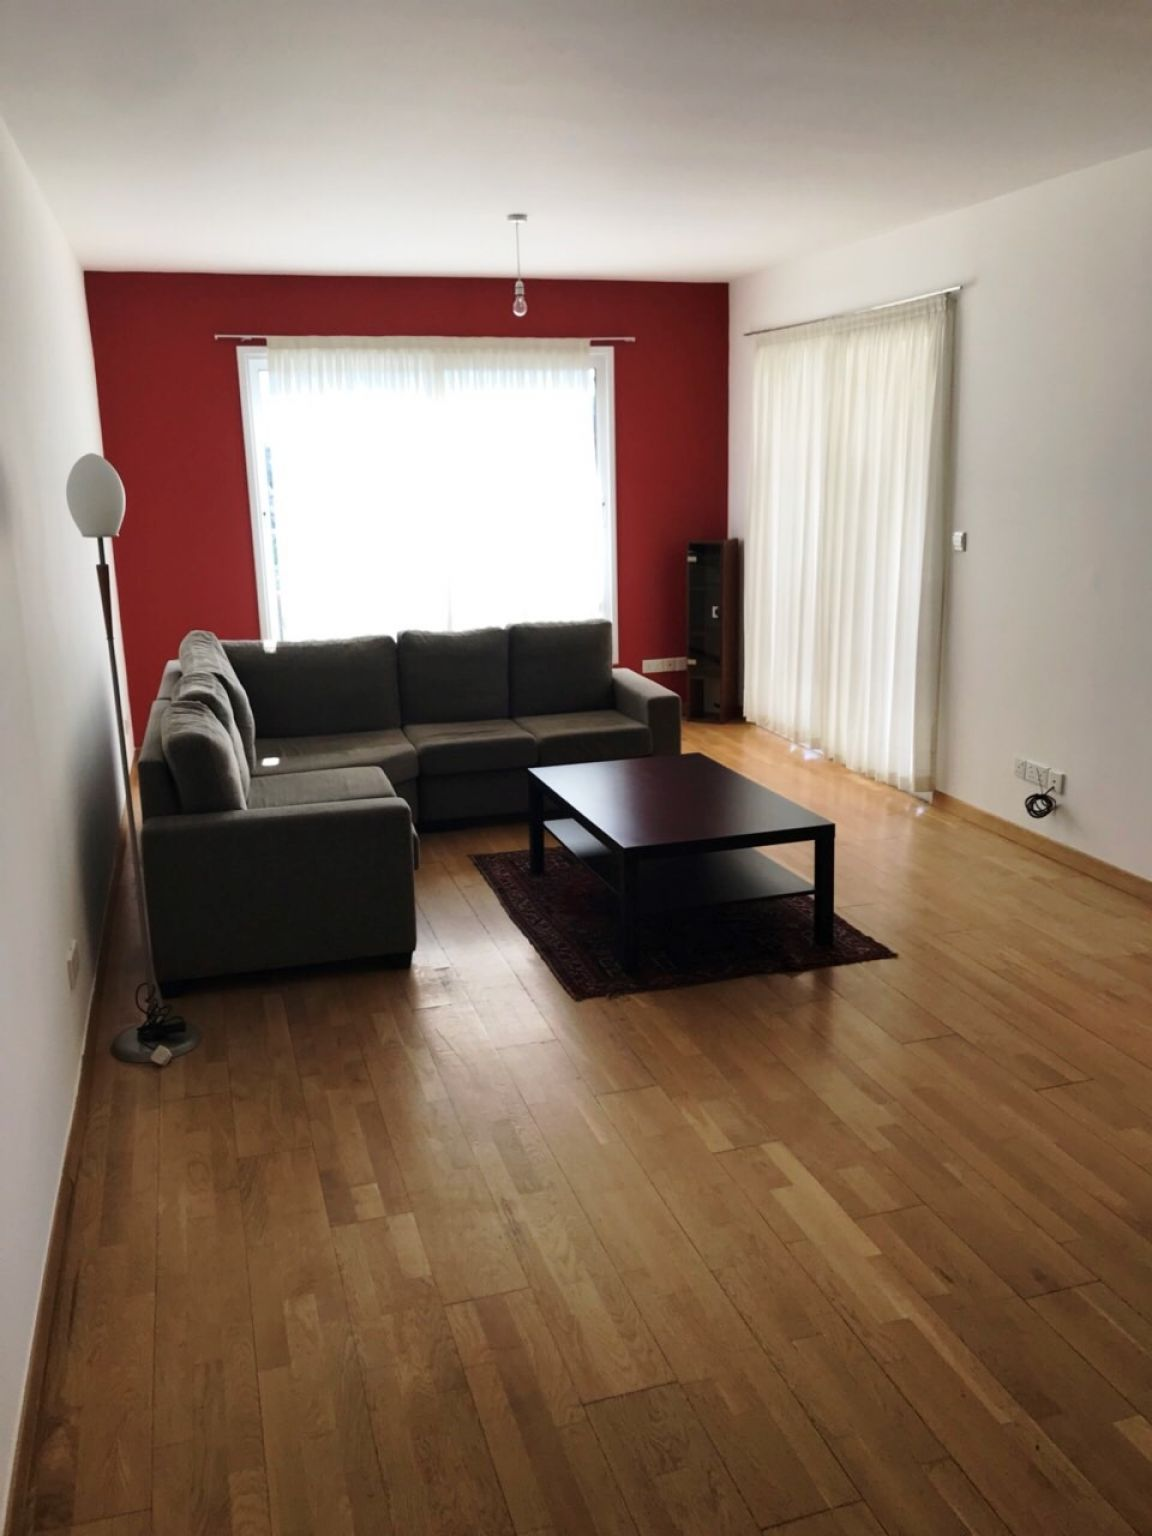 3 bedroom apartment in Mesa Yeitonia, Limassol  3 Bedrooms F.....